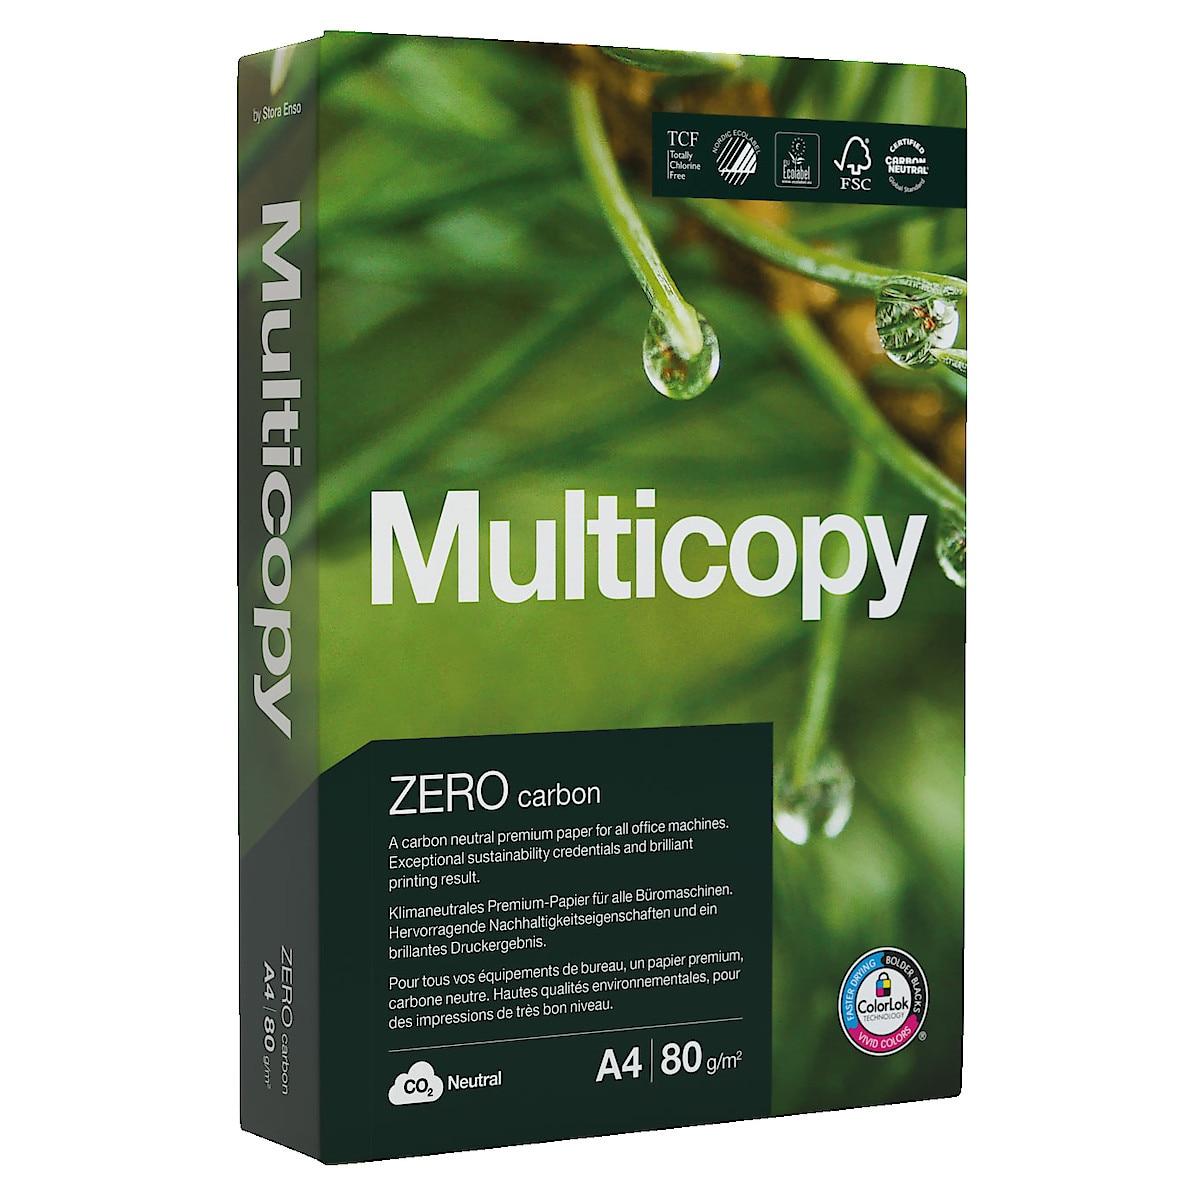 Multicopy Zero 80 g/m² kopipapir